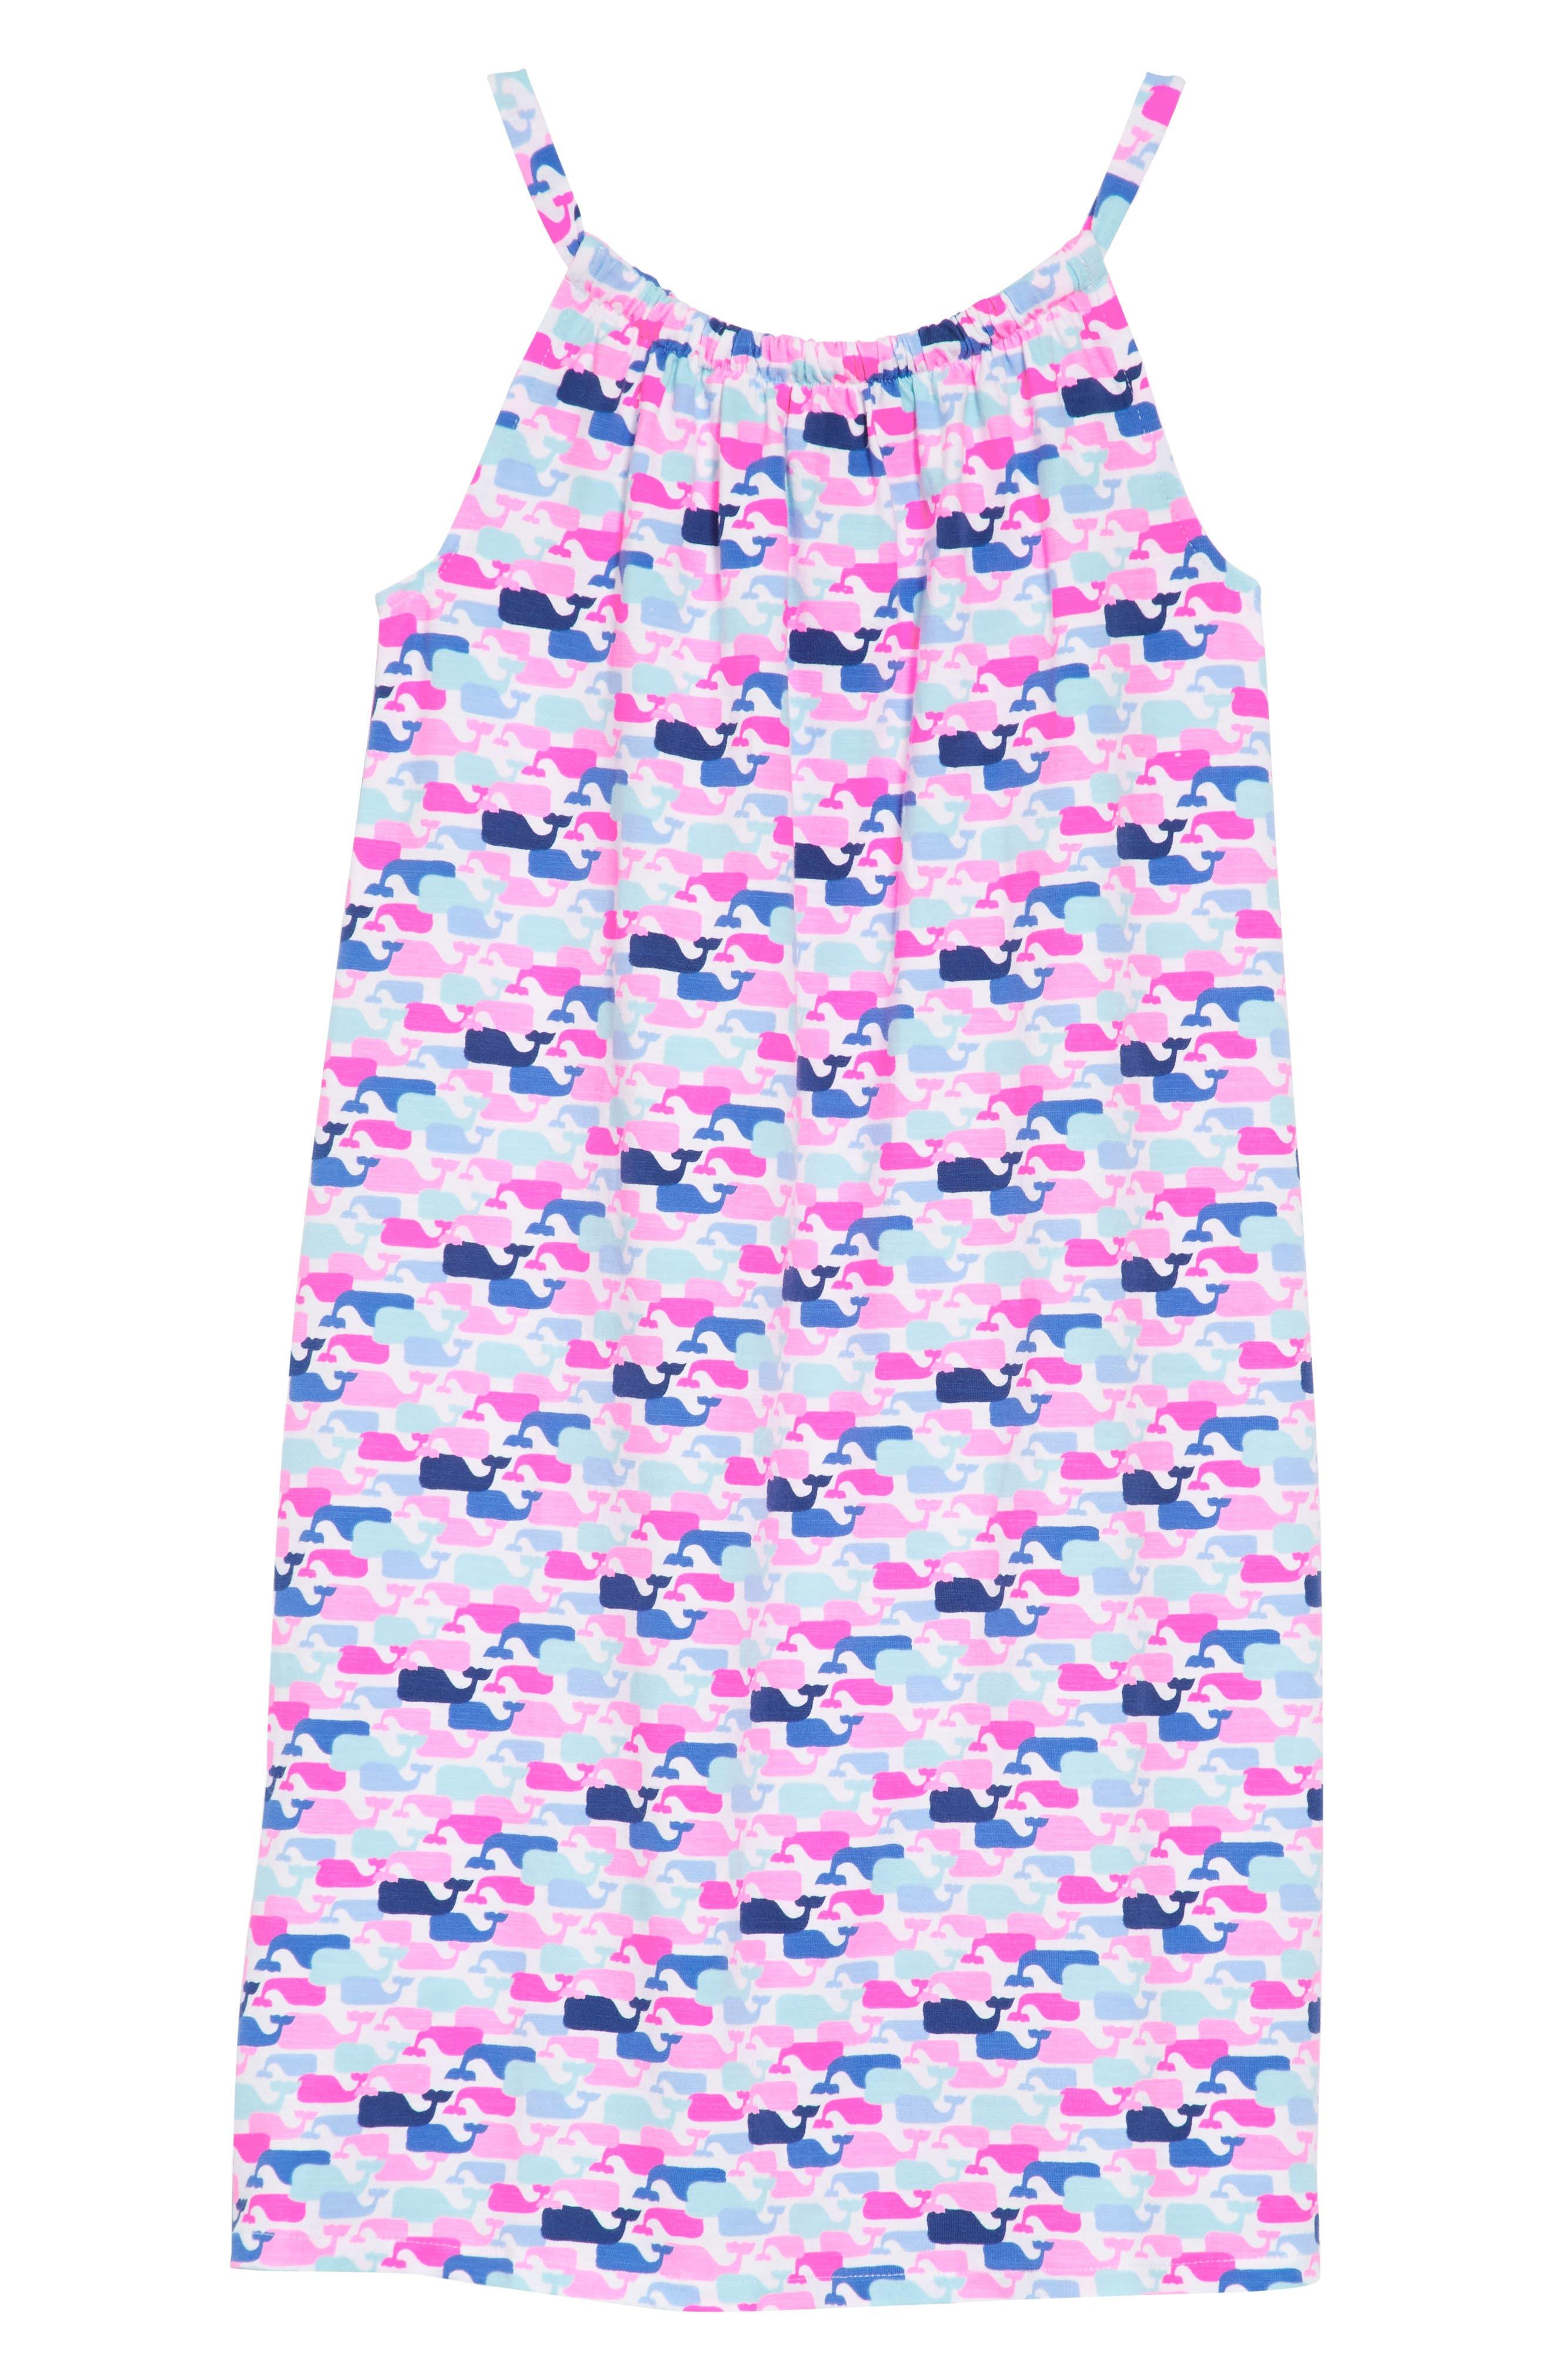 Whale Print Dress,                             Main thumbnail 1, color,                             100